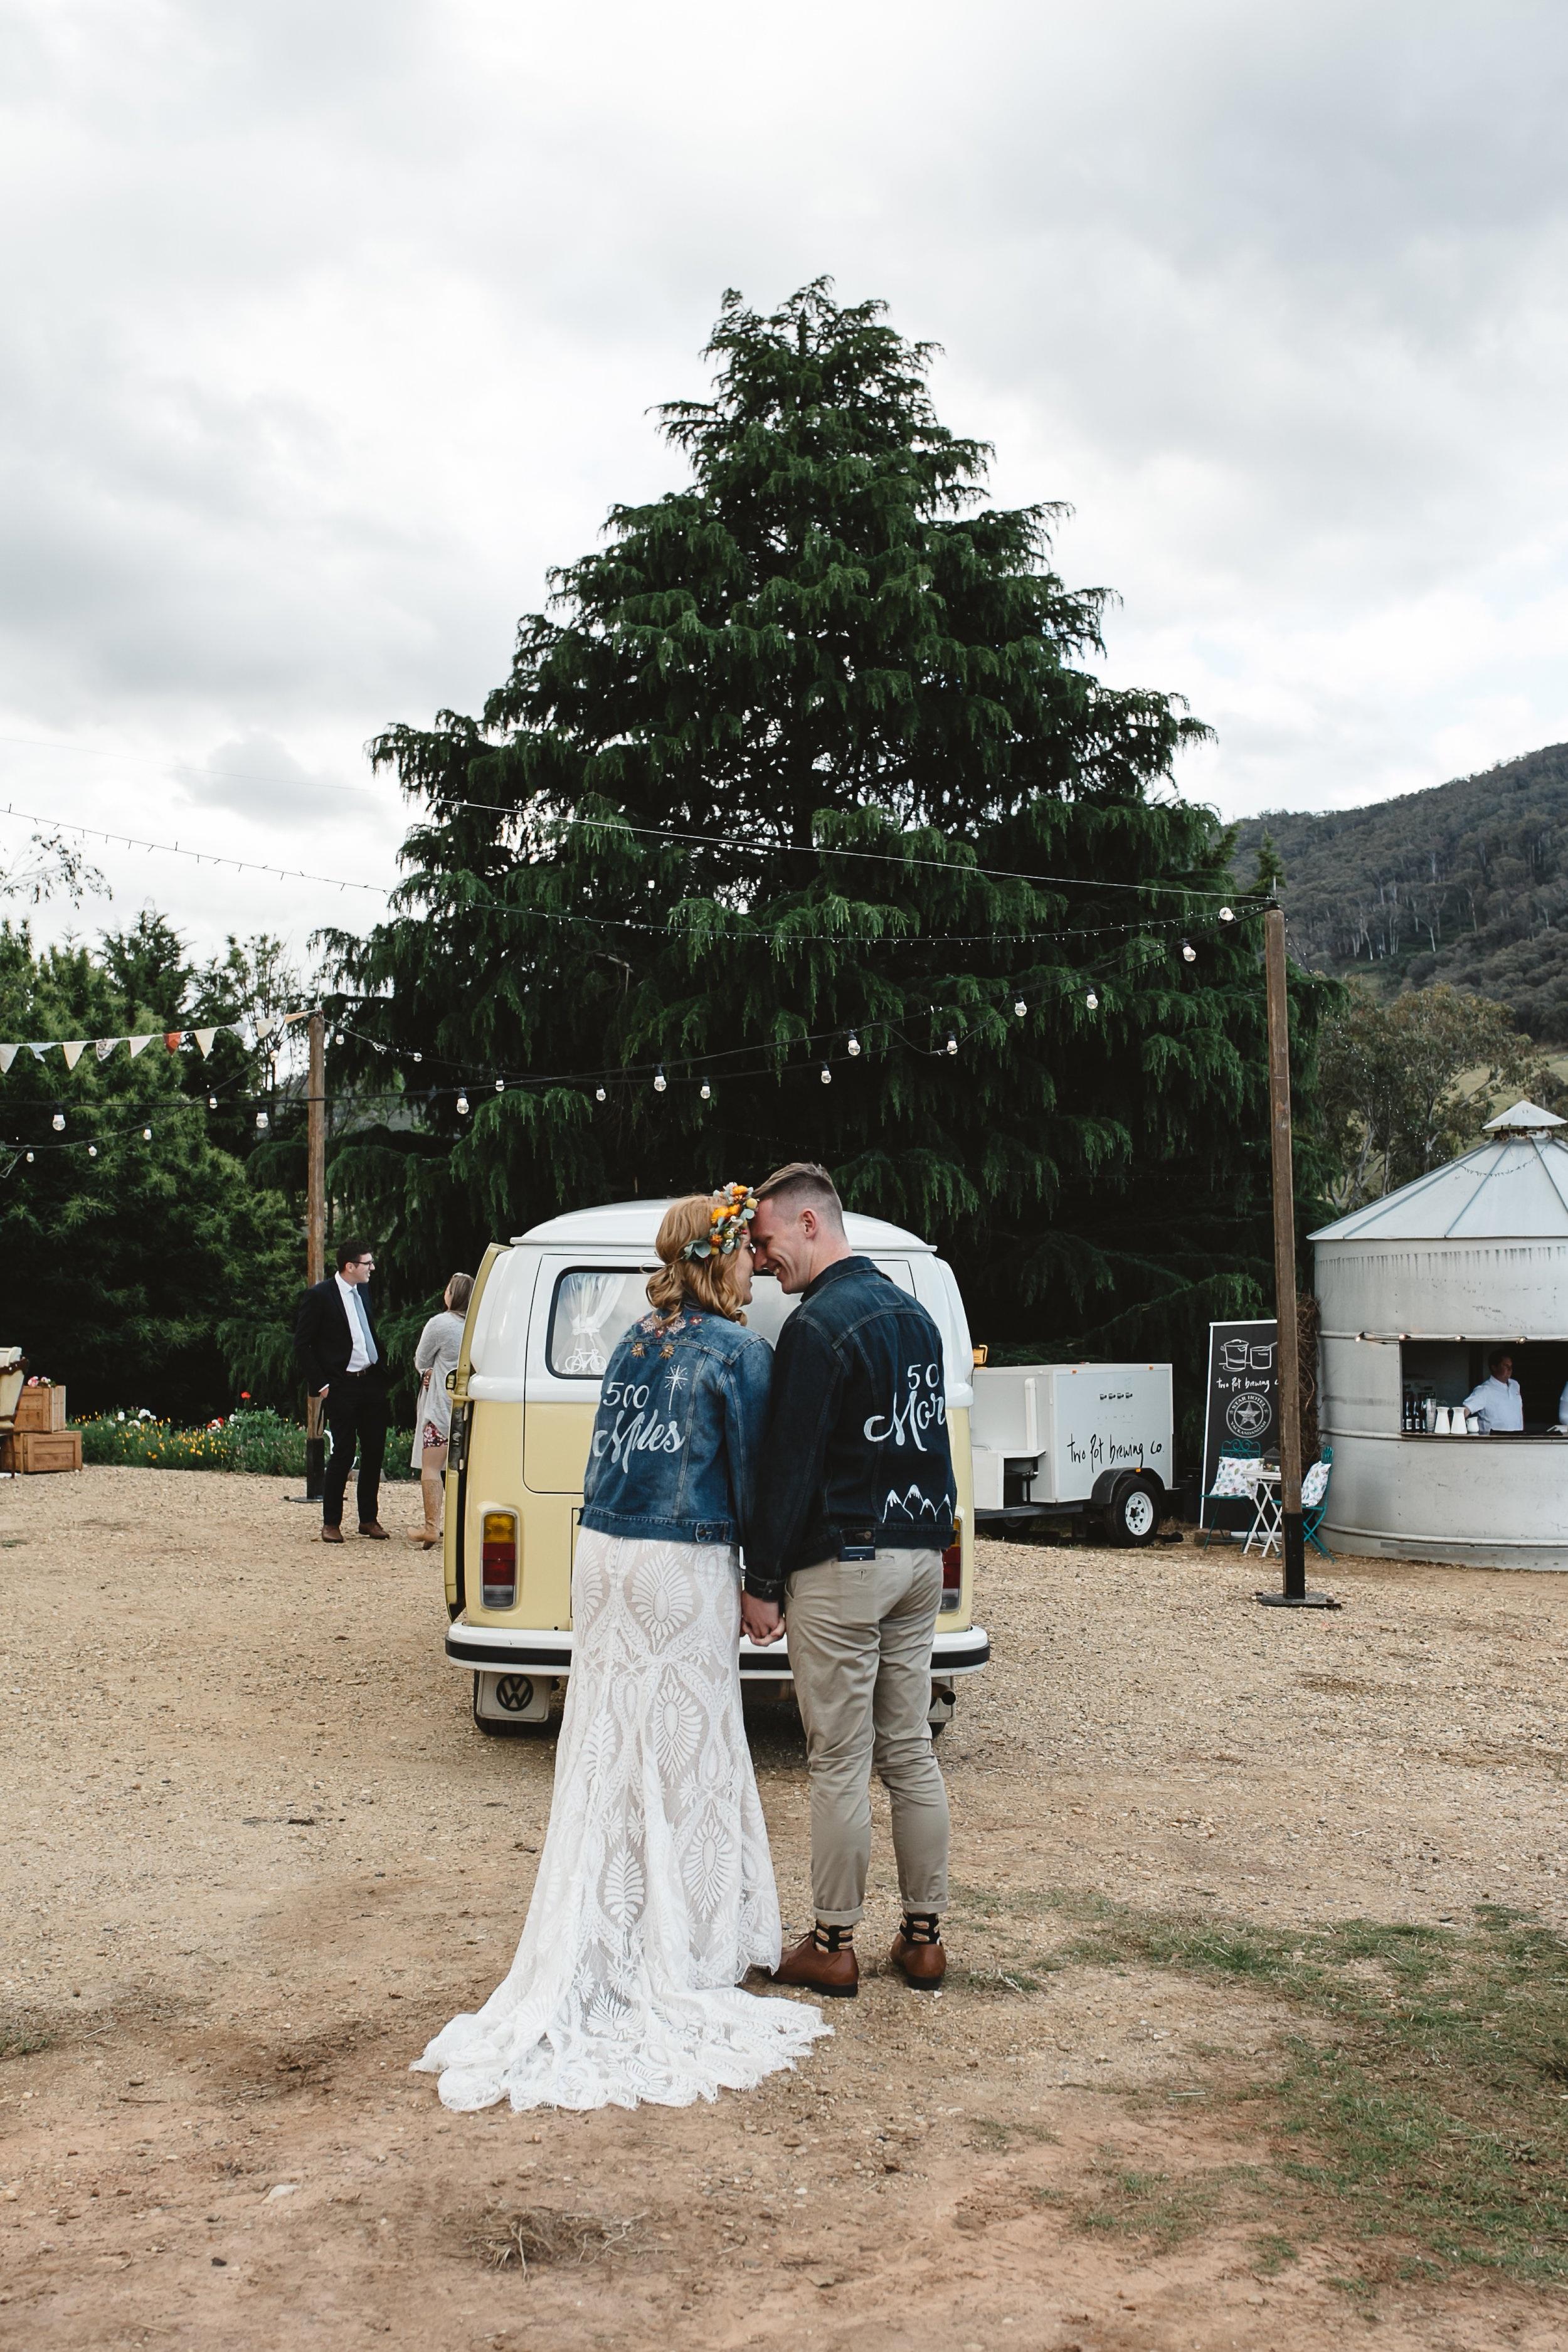 Wedding photography outdoors in the Mornington peninsula